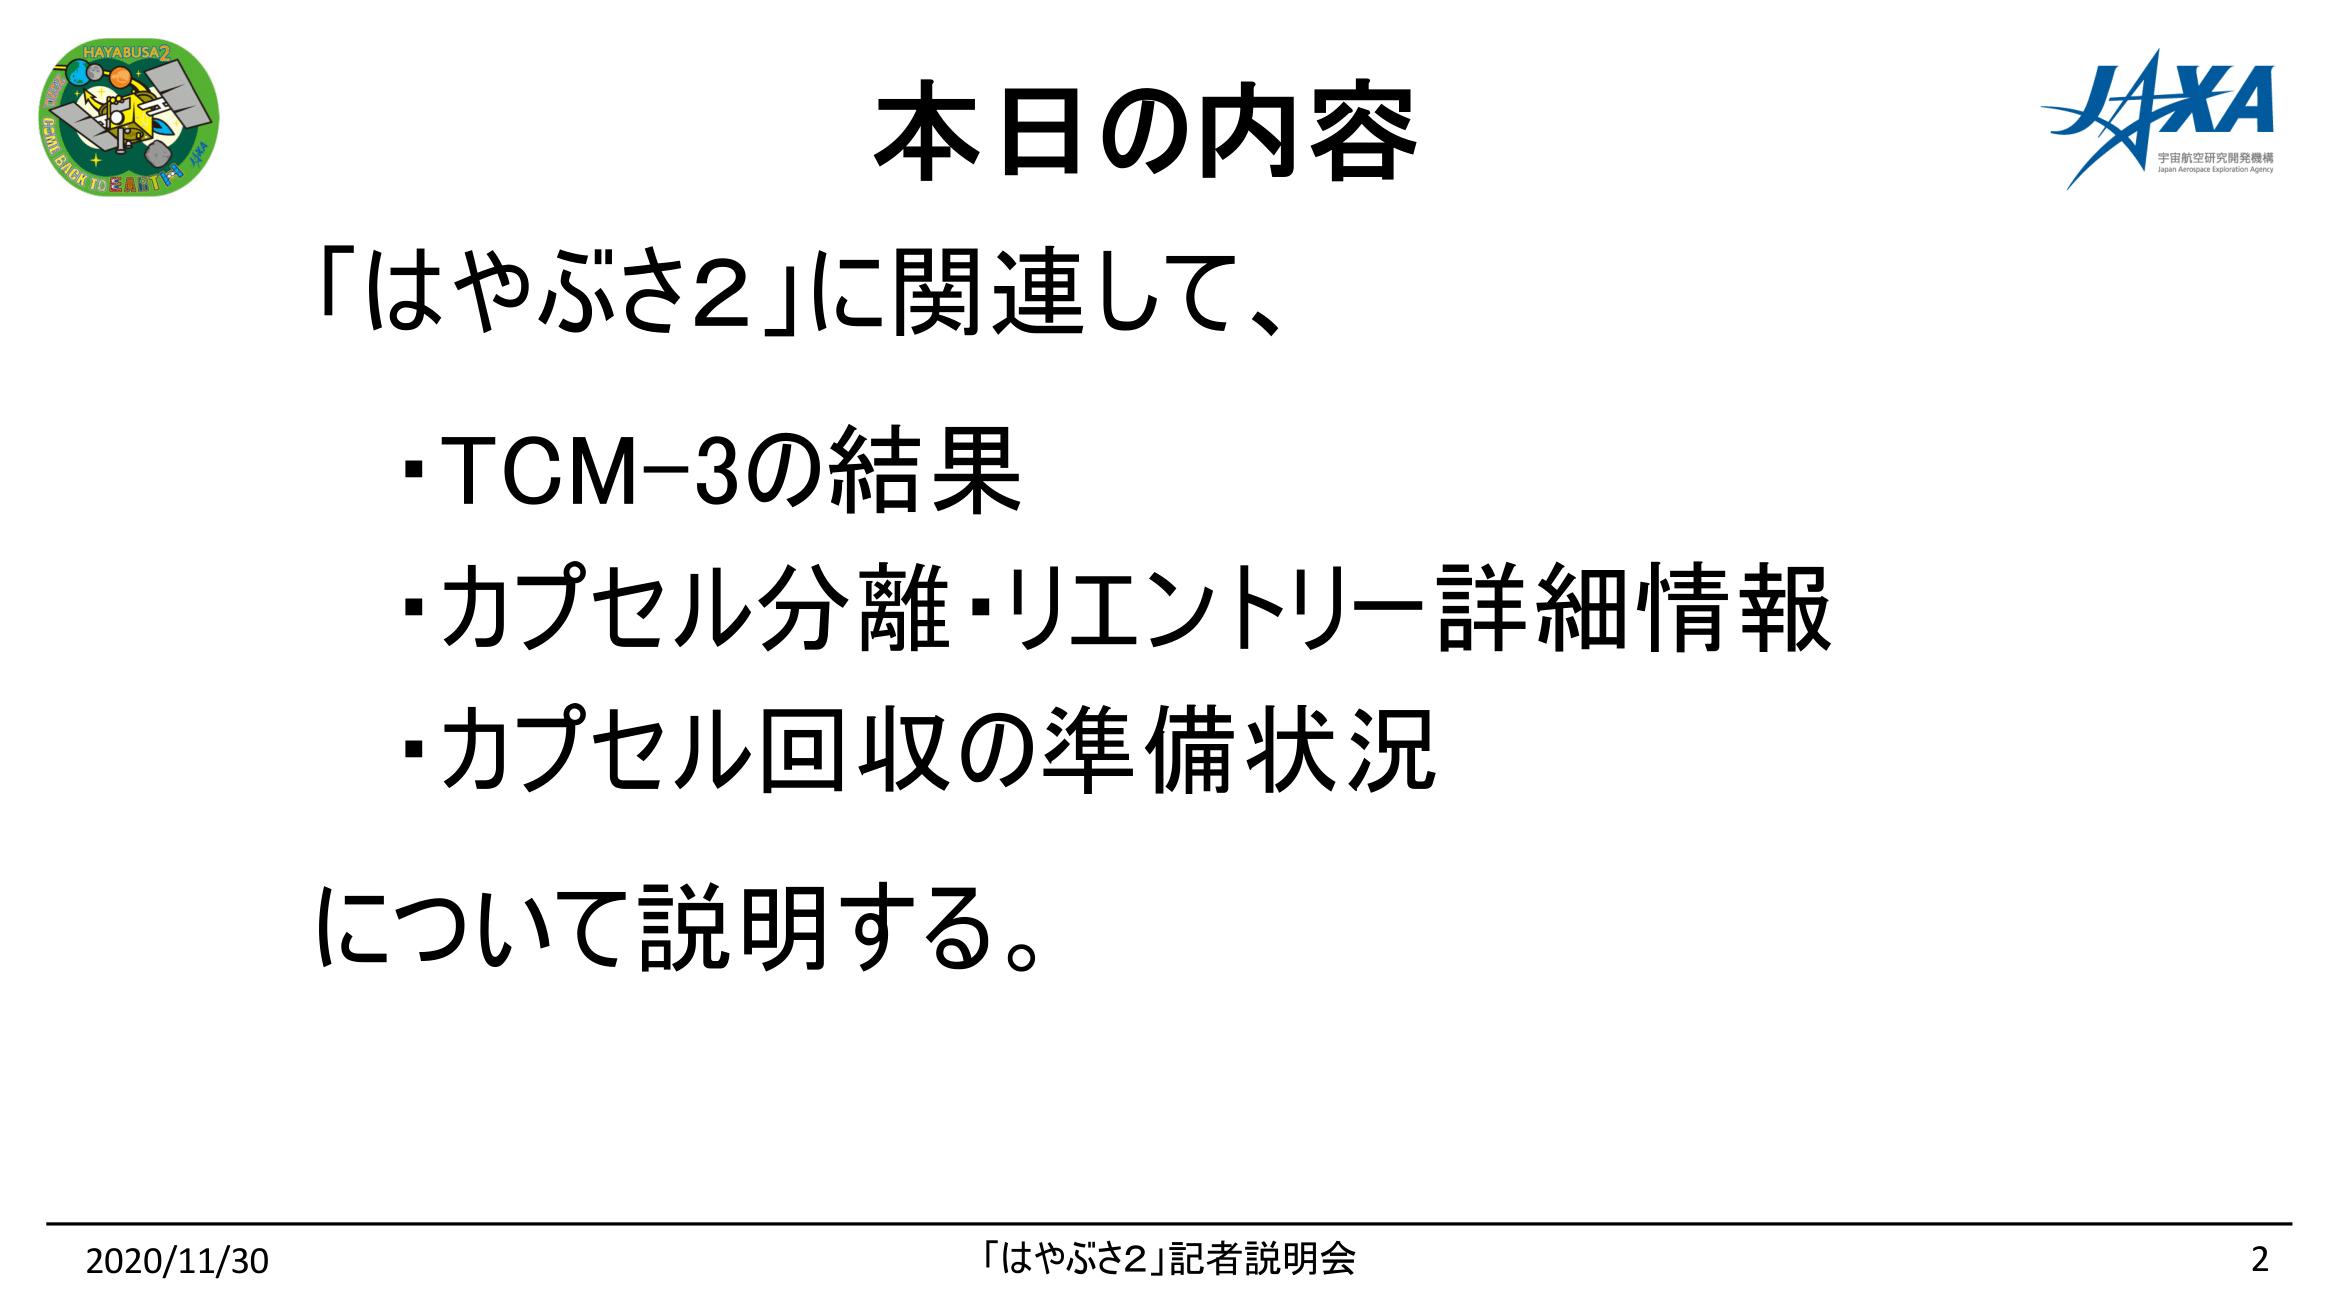 f:id:Imamura:20201130153921p:plain